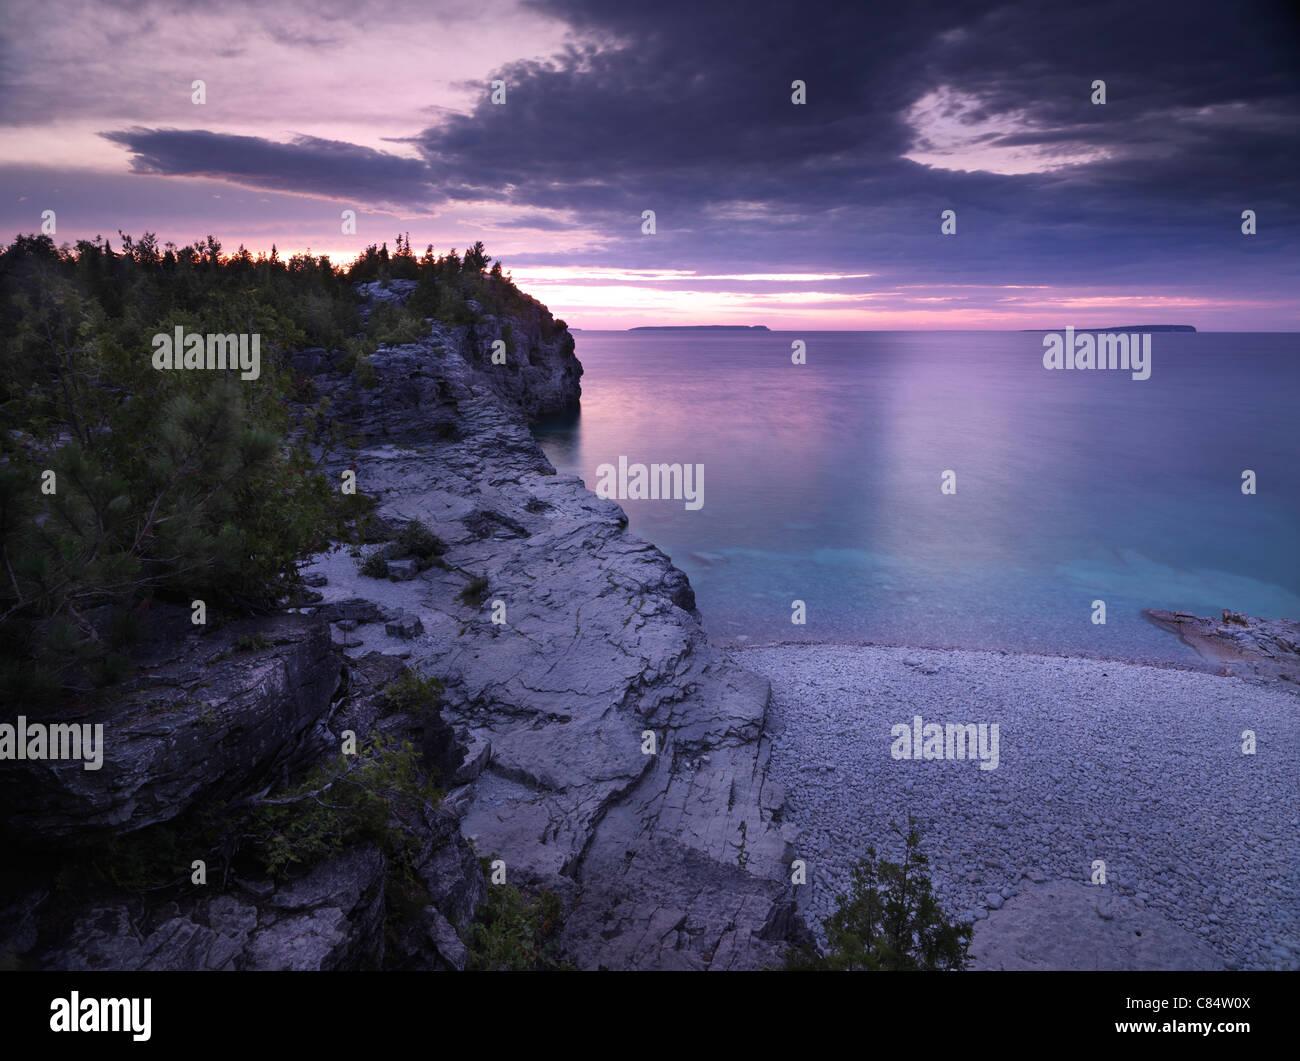 Schöner Sonnenuntergang Landschaft der Georgian Bay Felsenufer. Bruce Peninsula National Park, Ontario, Kanada. Stockbild